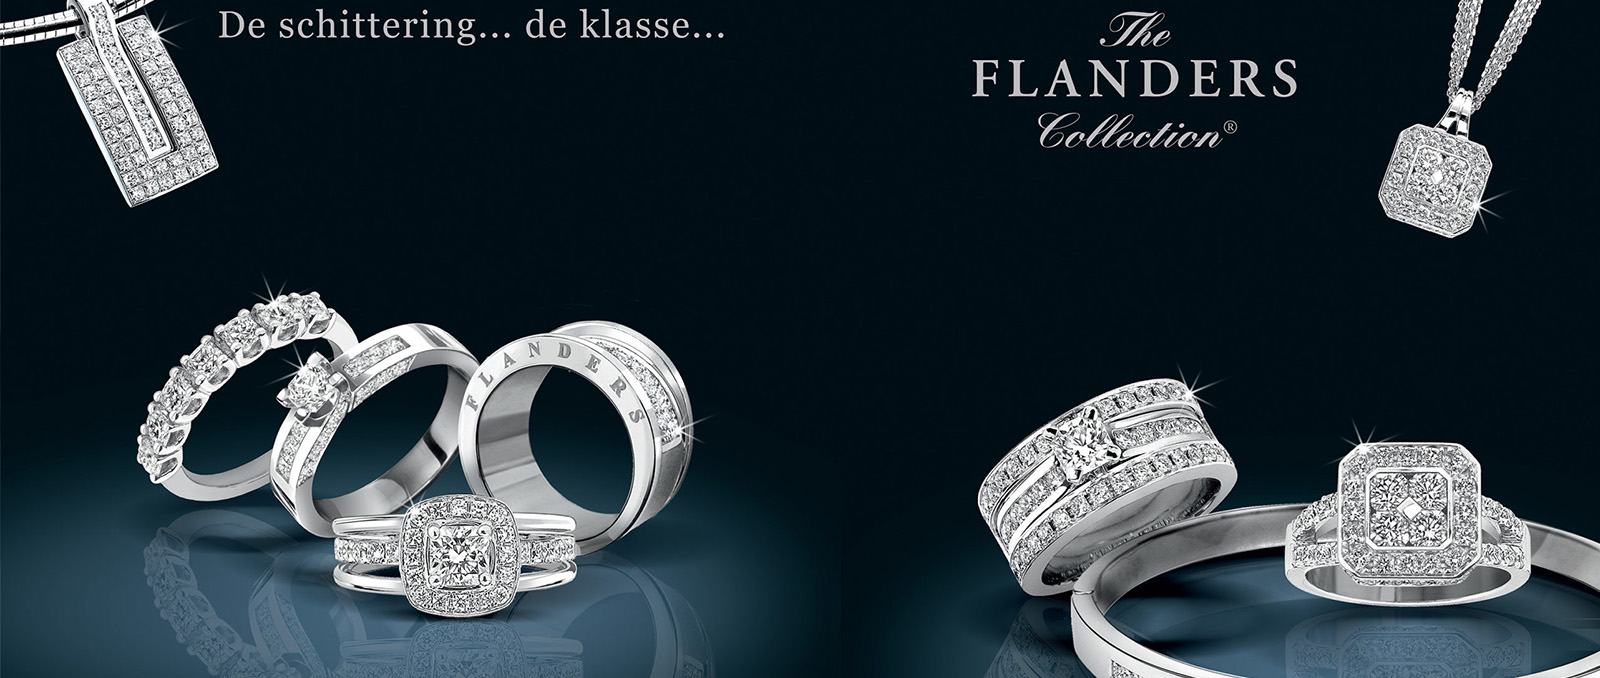 Flanders-banner-klein-e1574036065201